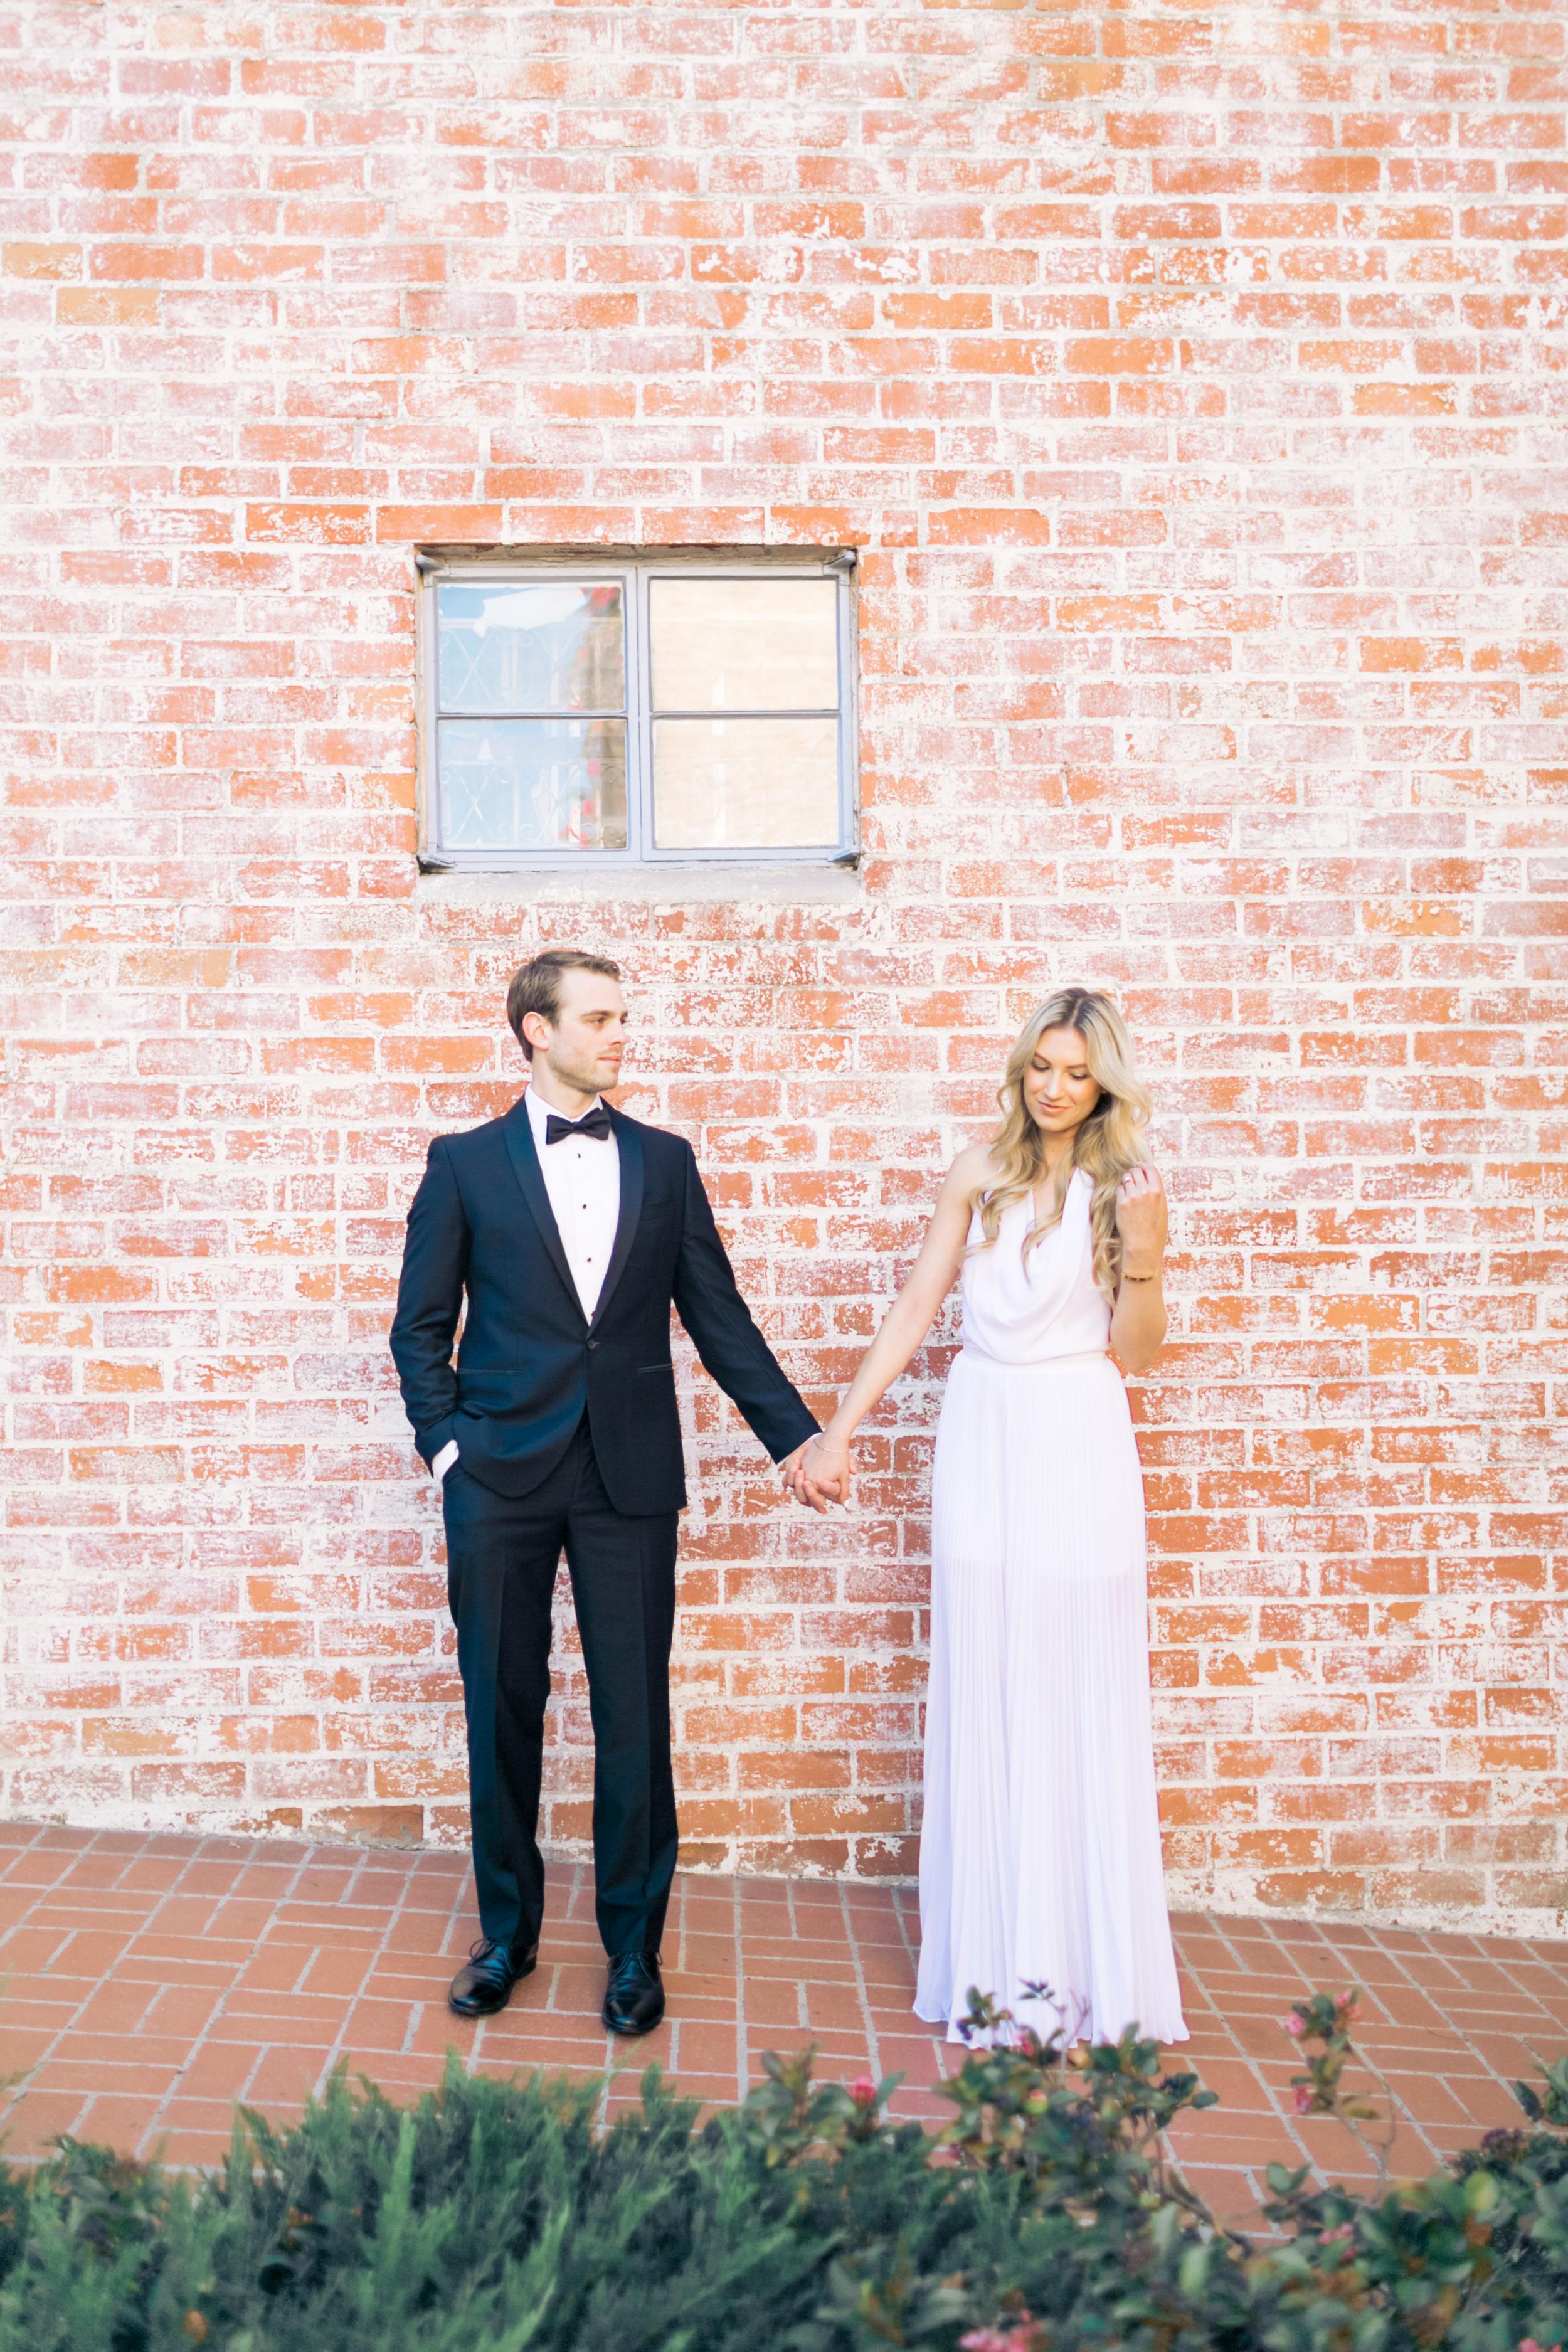 2015Natalie Schutt Photography- Palos Verdes Wedding-9.JPG